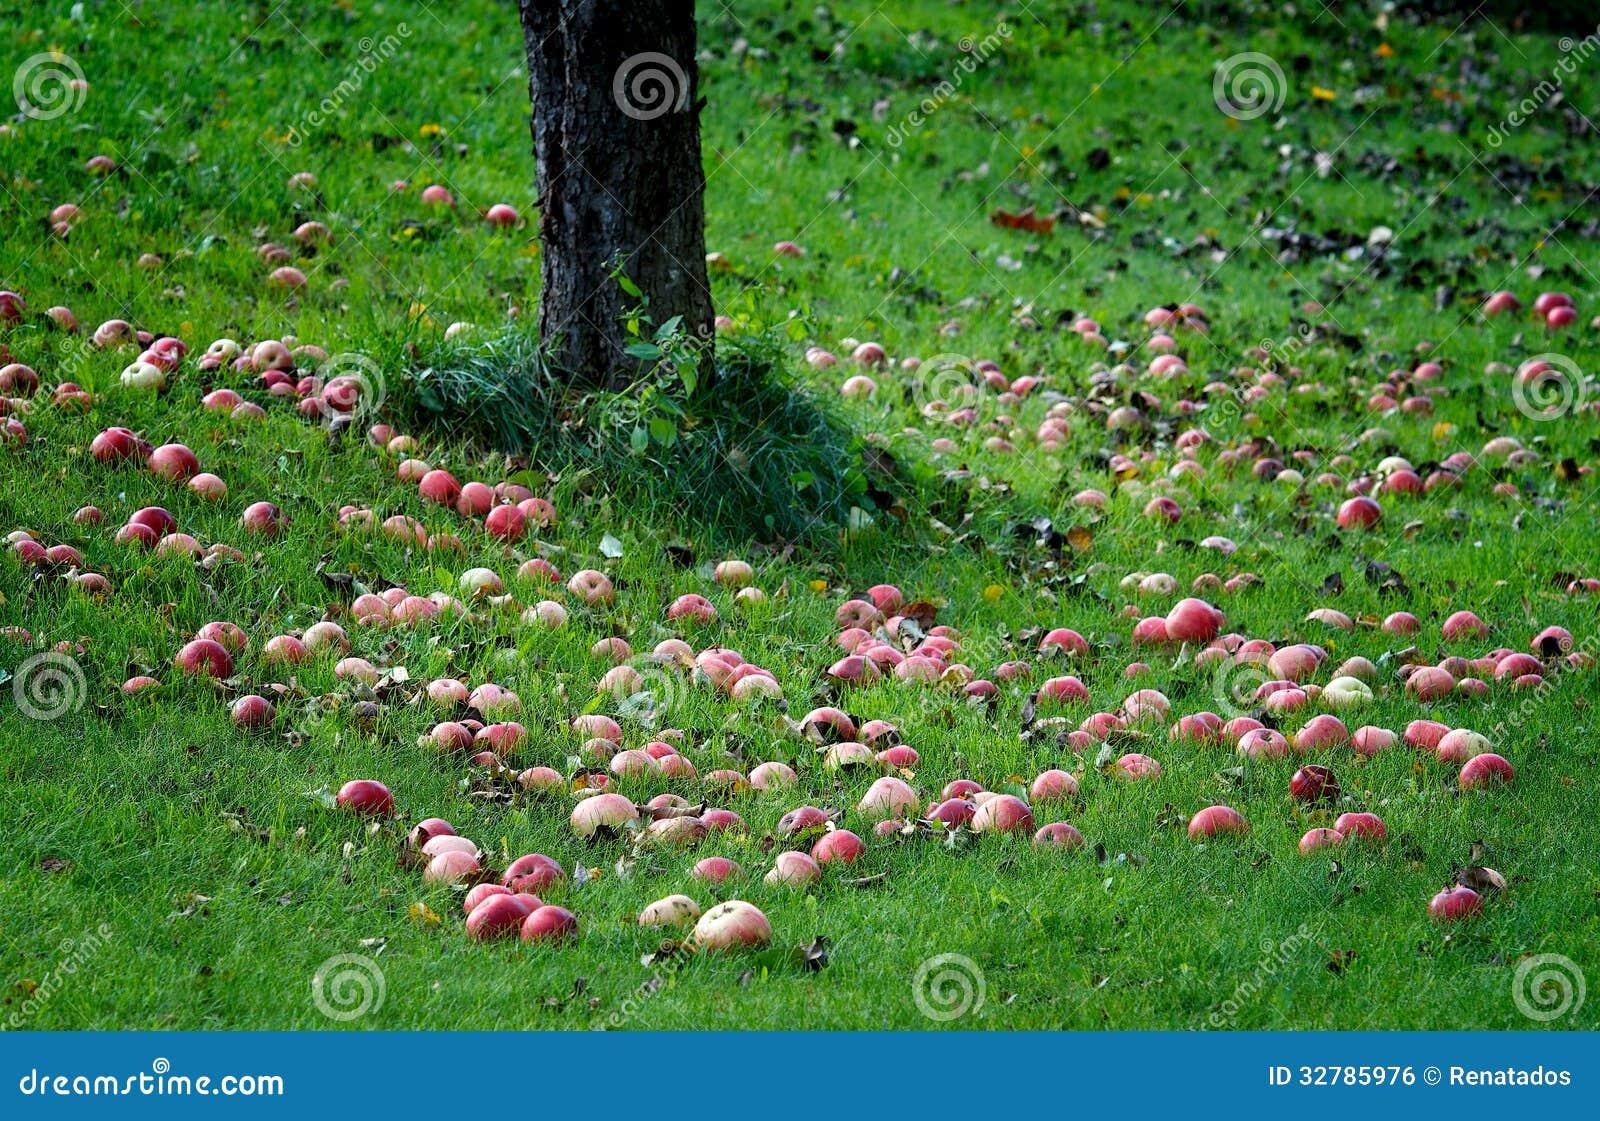 apple fruit background grass - photo #35